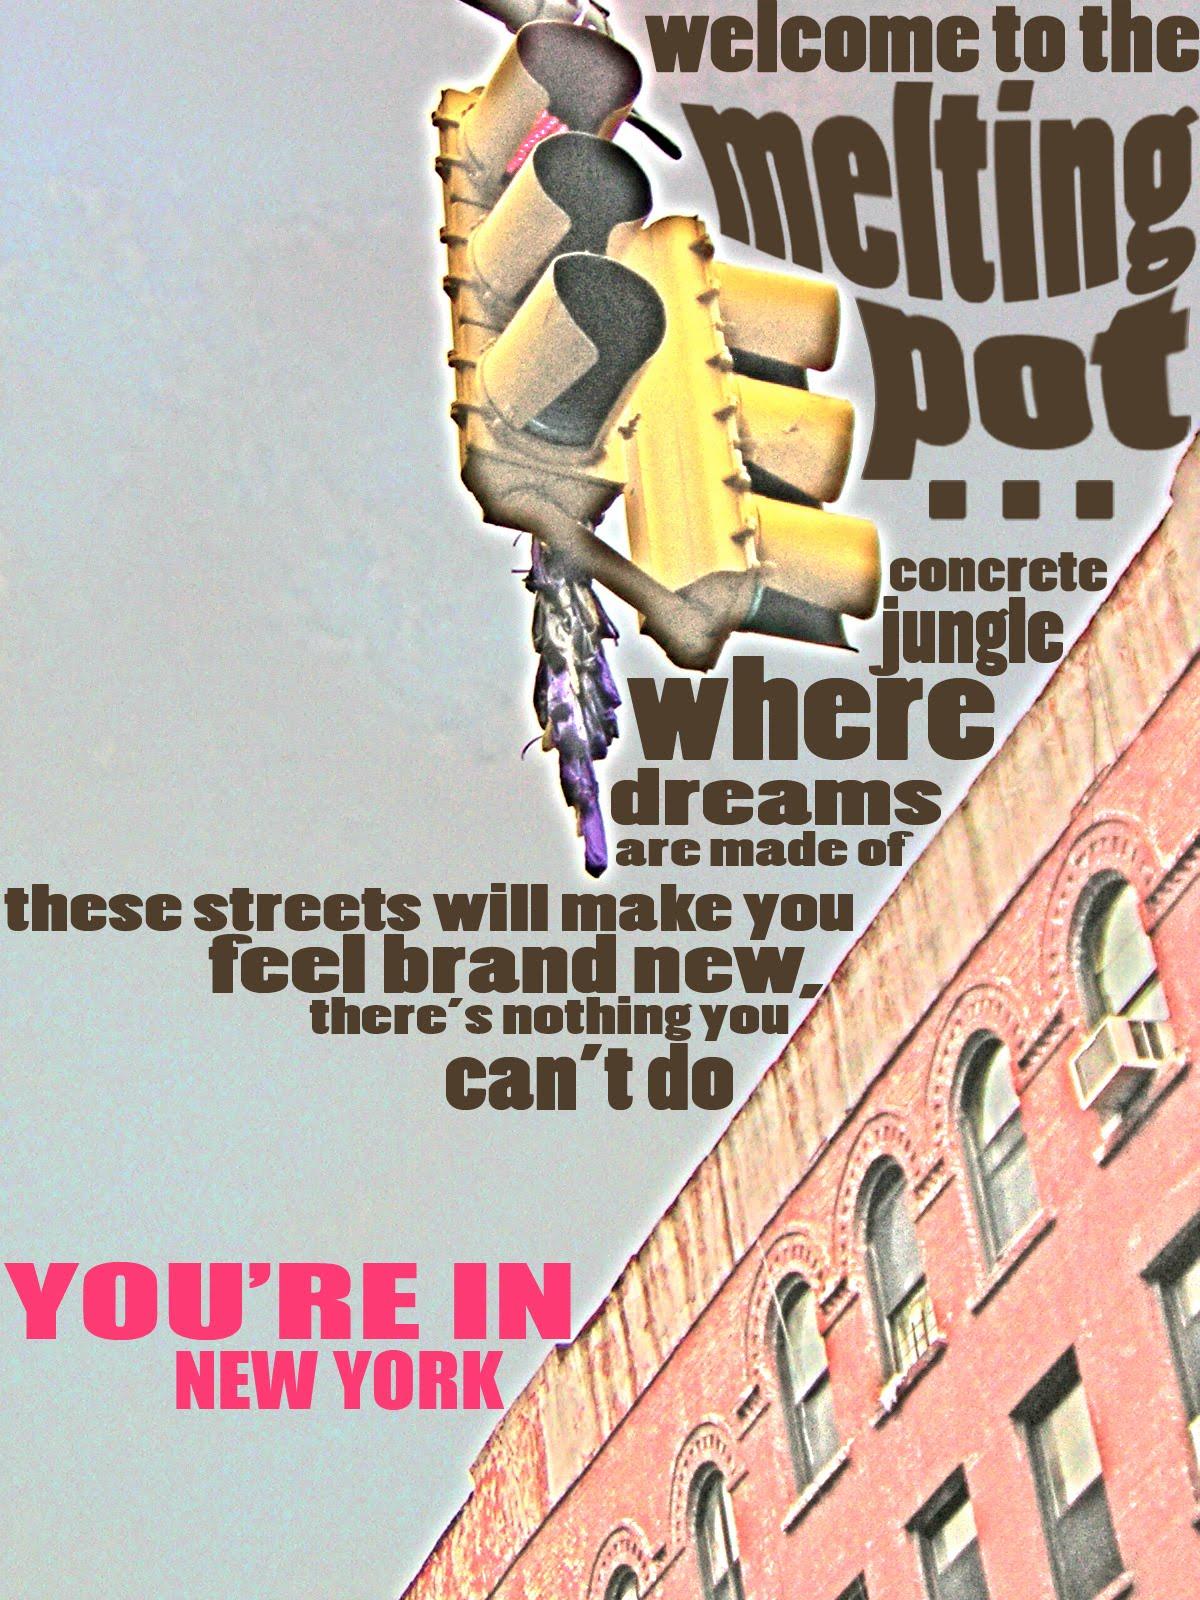 http://3.bp.blogspot.com/_pwvic3l_SAI/TDZ5SIH-jrI/AAAAAAAAAaQ/xYKAnDD5yjg/s1600/empire+state+of+mind+-+nrp.jpg